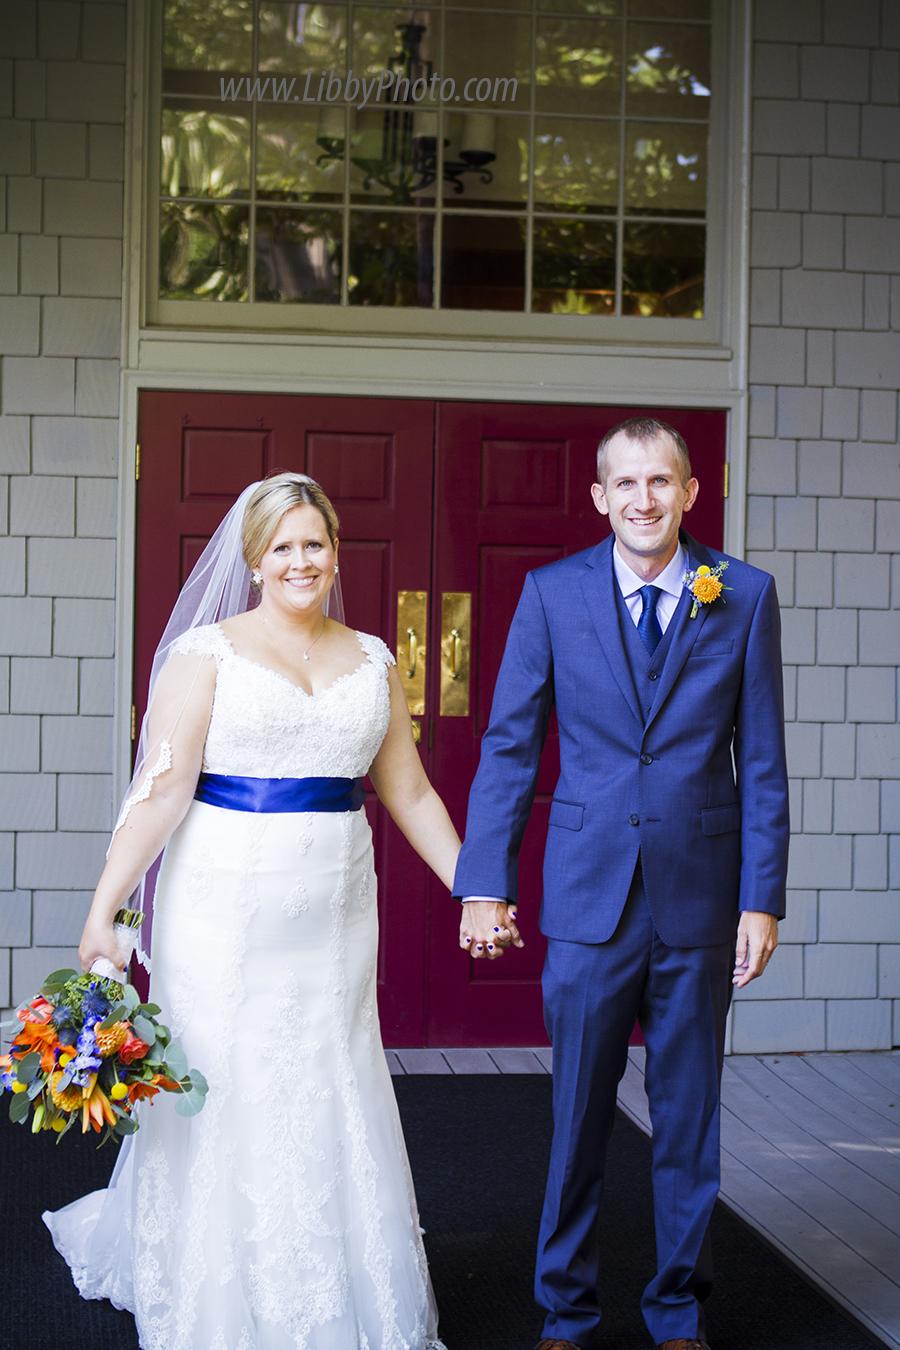 Atlanta wedding photography, Libbyphoto11 (11).jpg